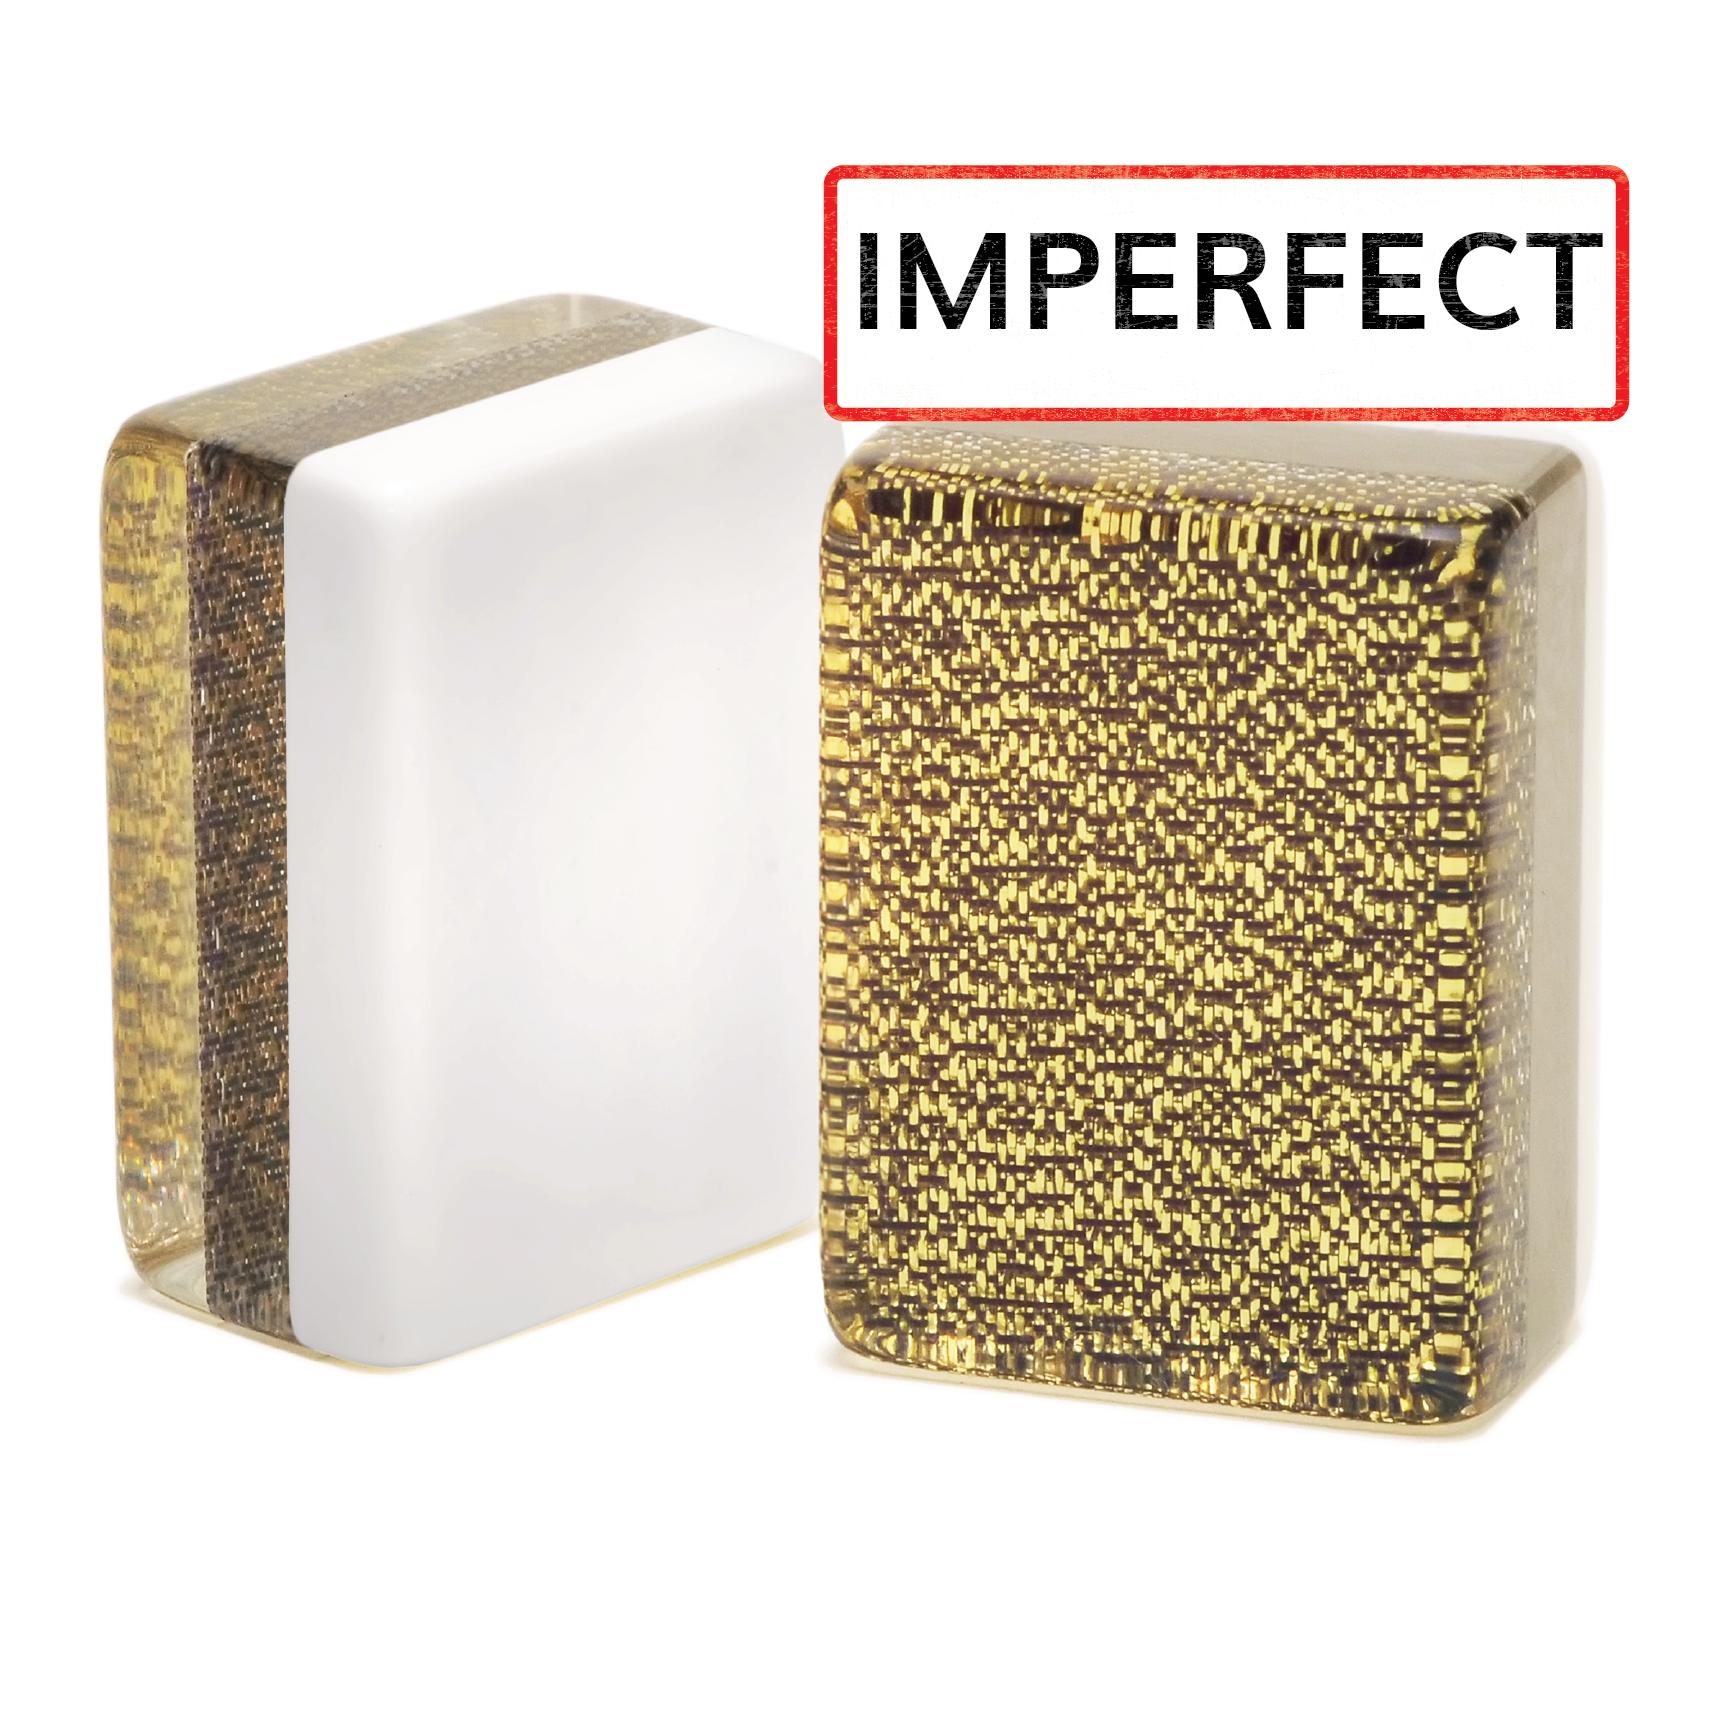 Imperfect Black and Gold Glitter Mah Jongg Tiles